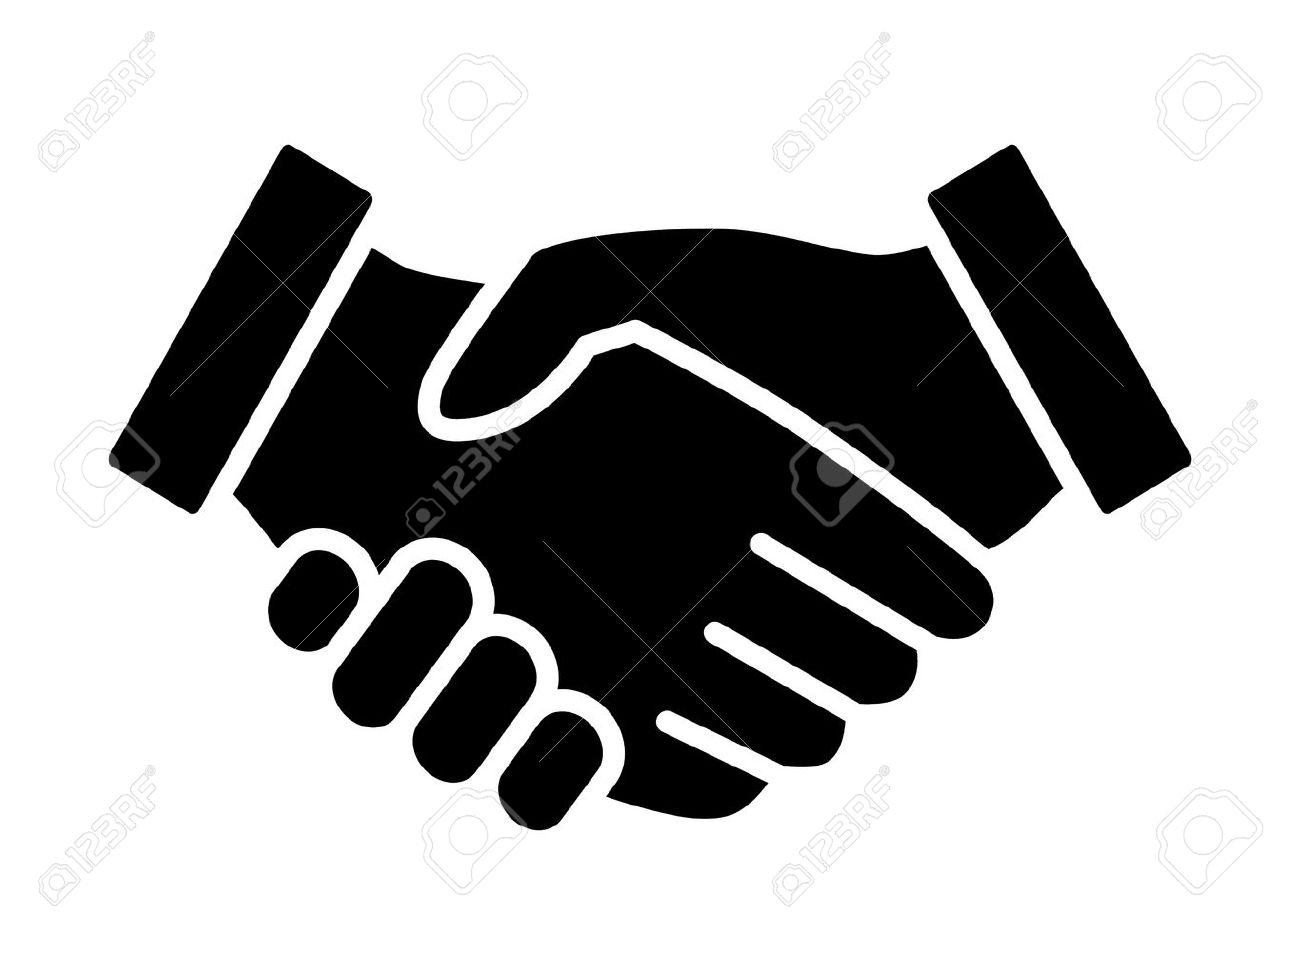 Business Agreement Handshake Or Friendly Handshake Line Art Icon ...